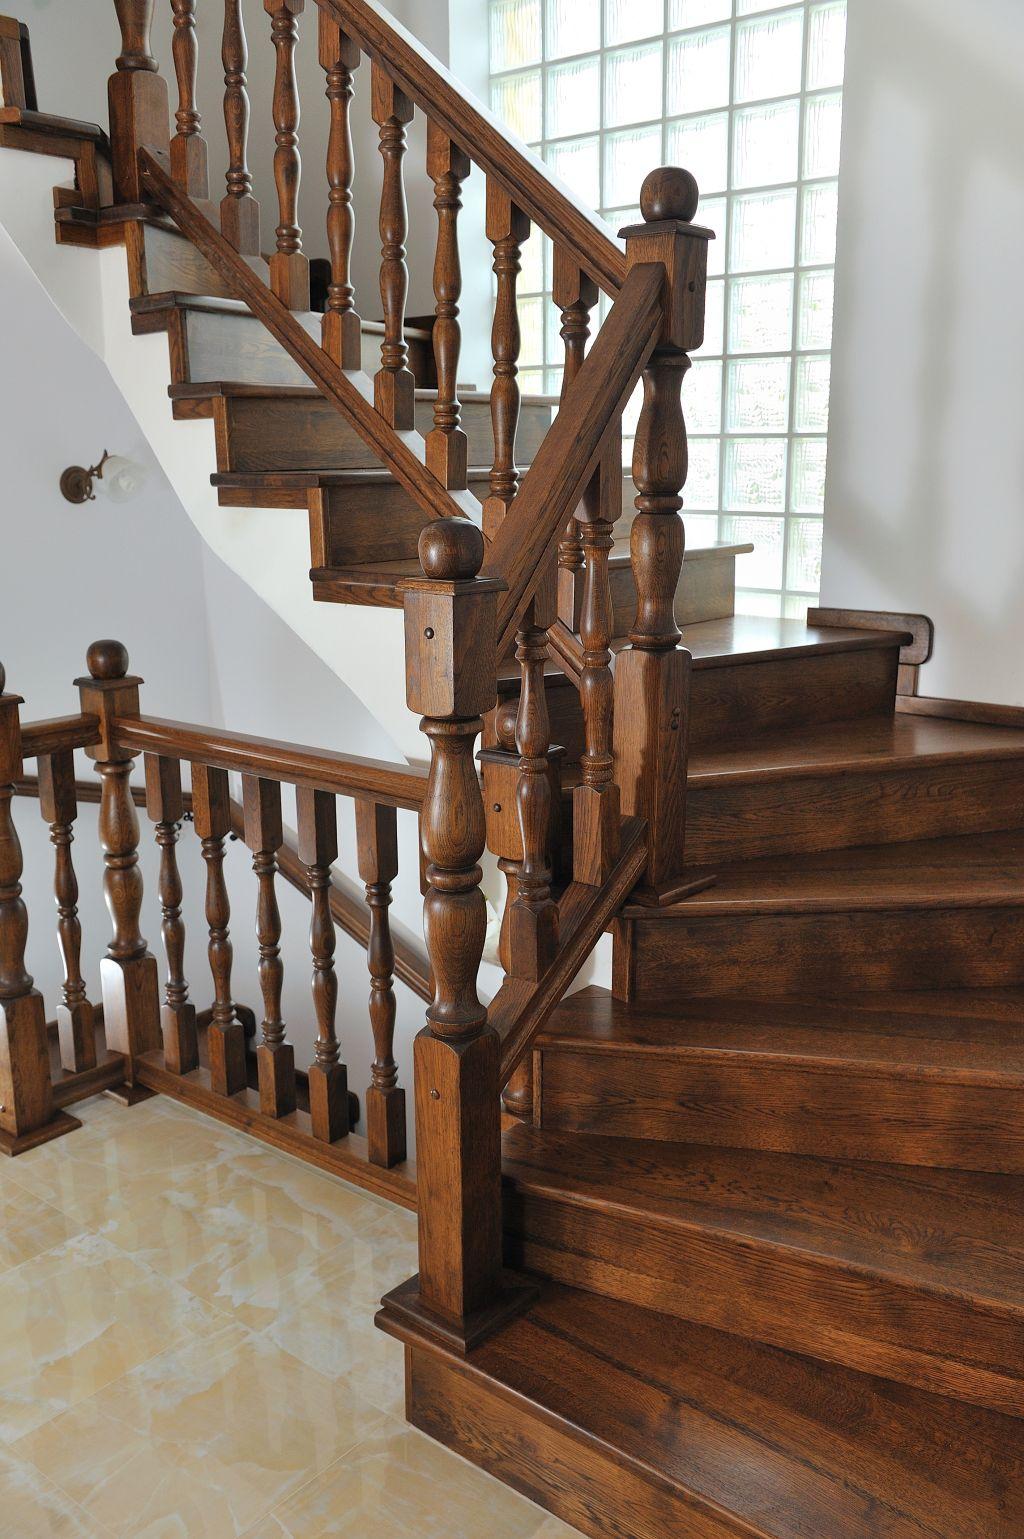 Scara interioara in stil clasic realizata din lemn masiv de Apollo Romania